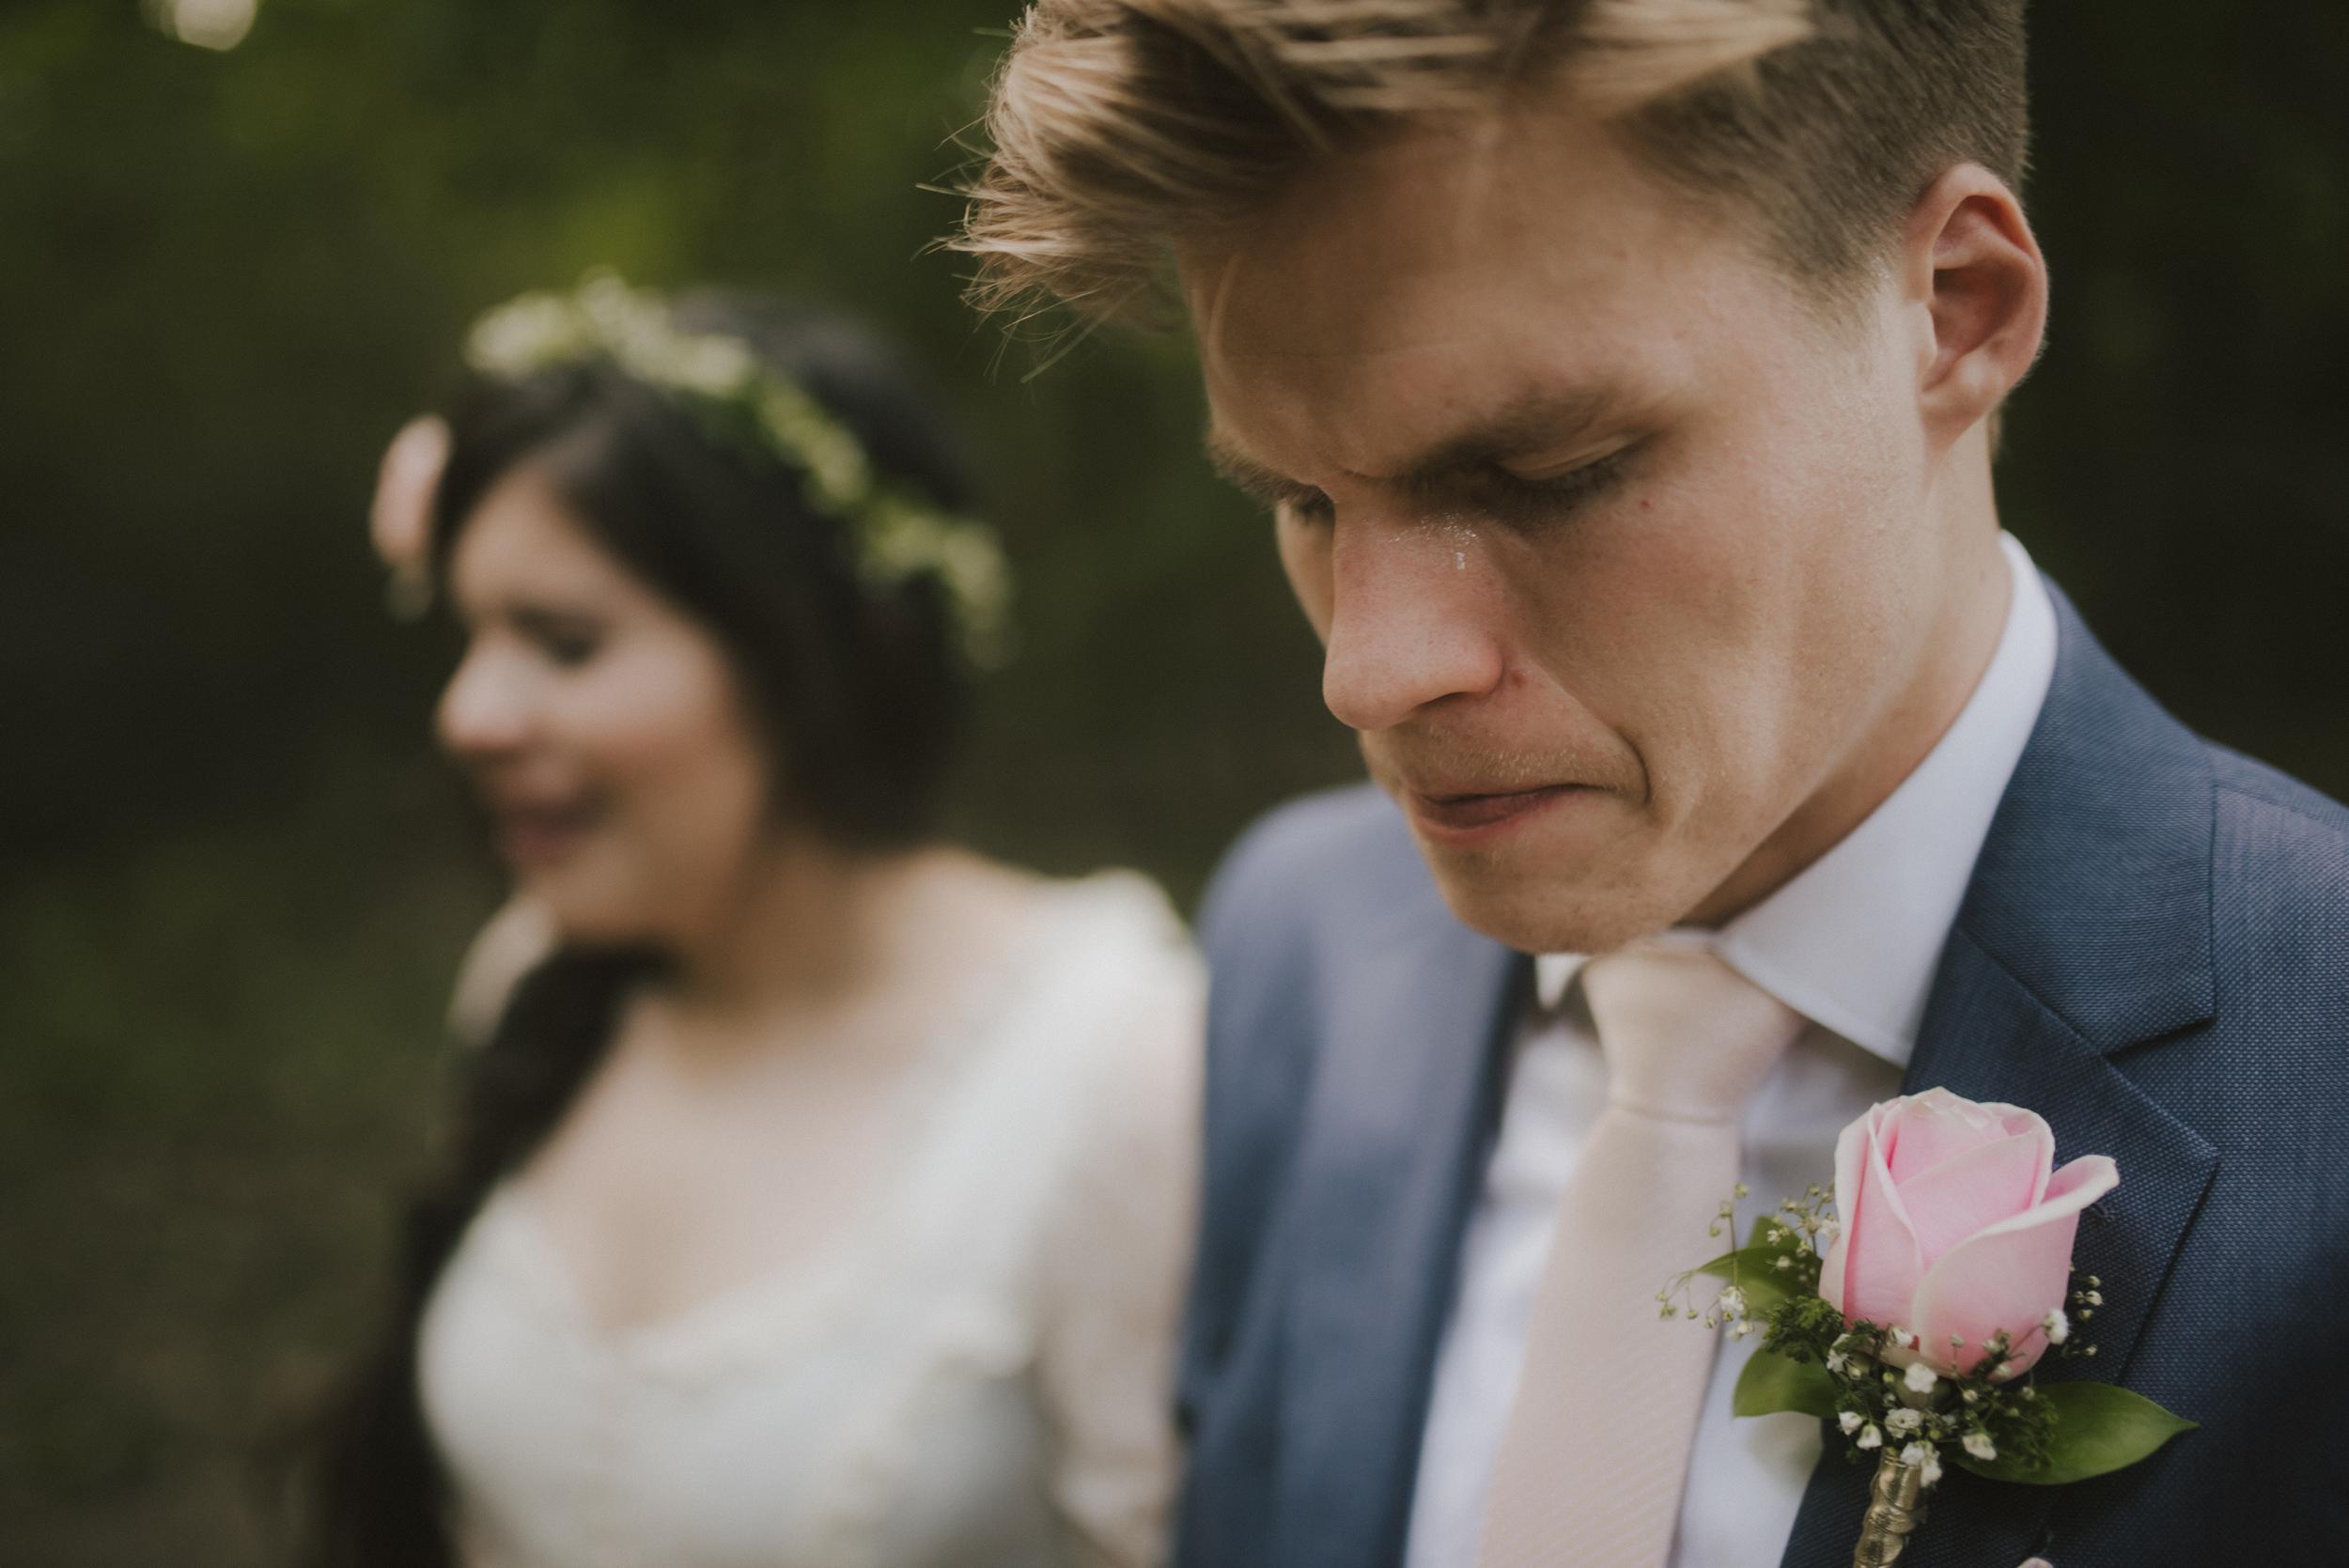 ofRen_weddingphotographer-155.jpg